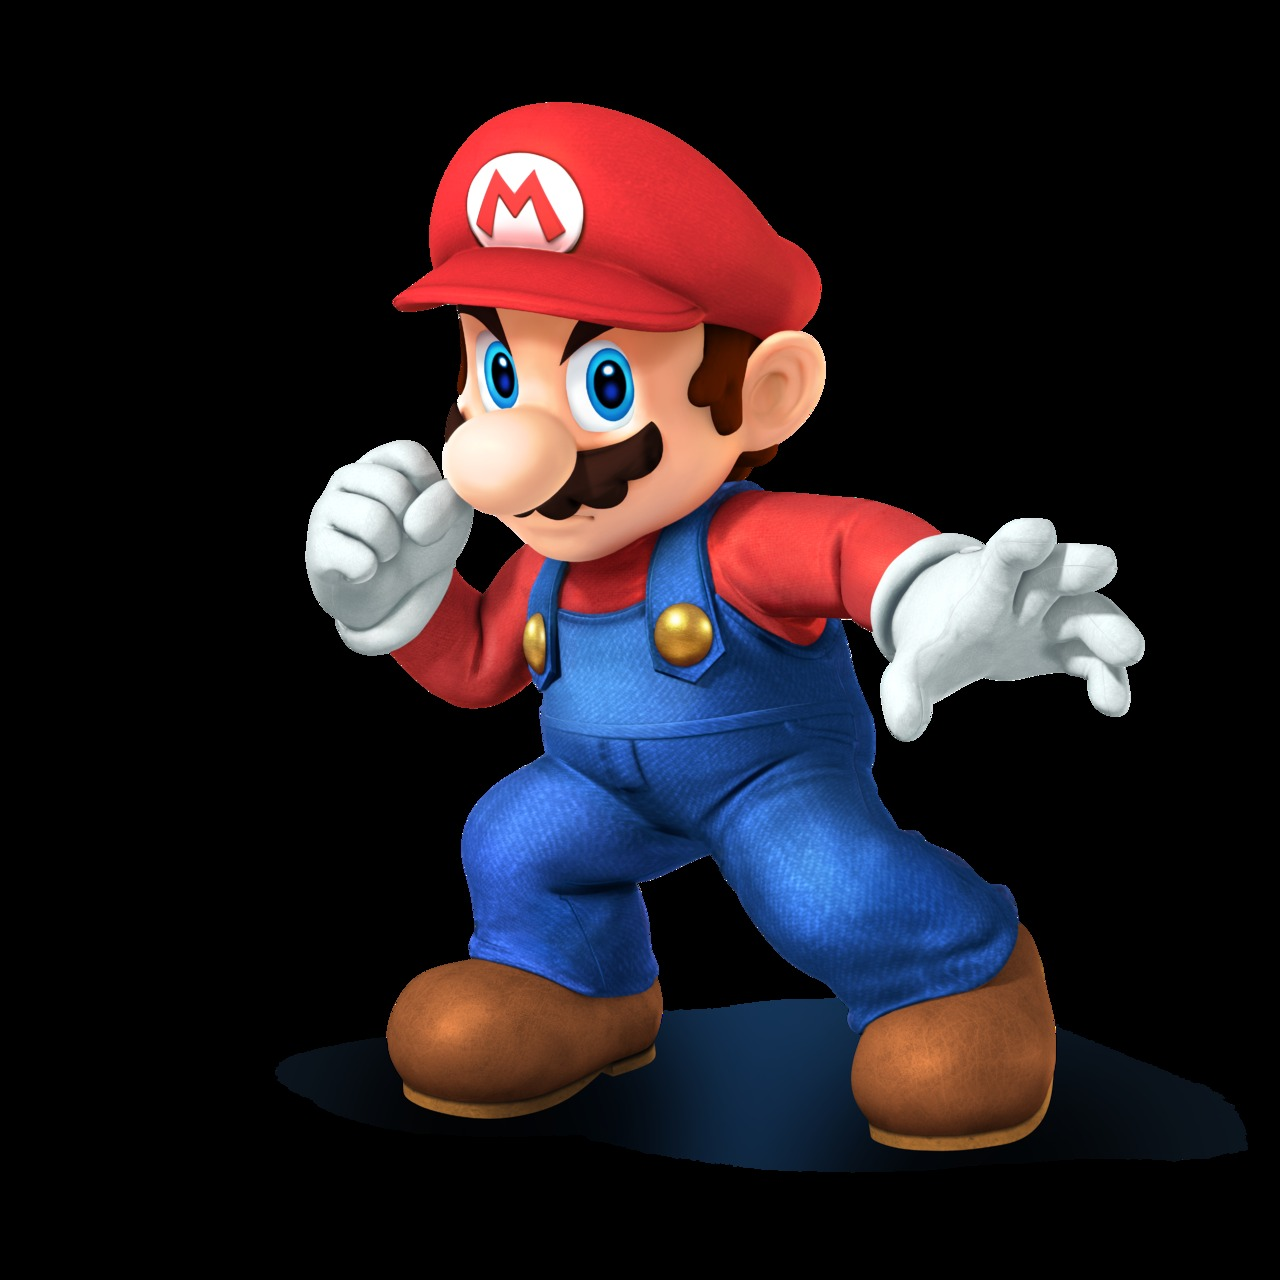 Super Smash Bros Wii U Wiiu 1370981490 092